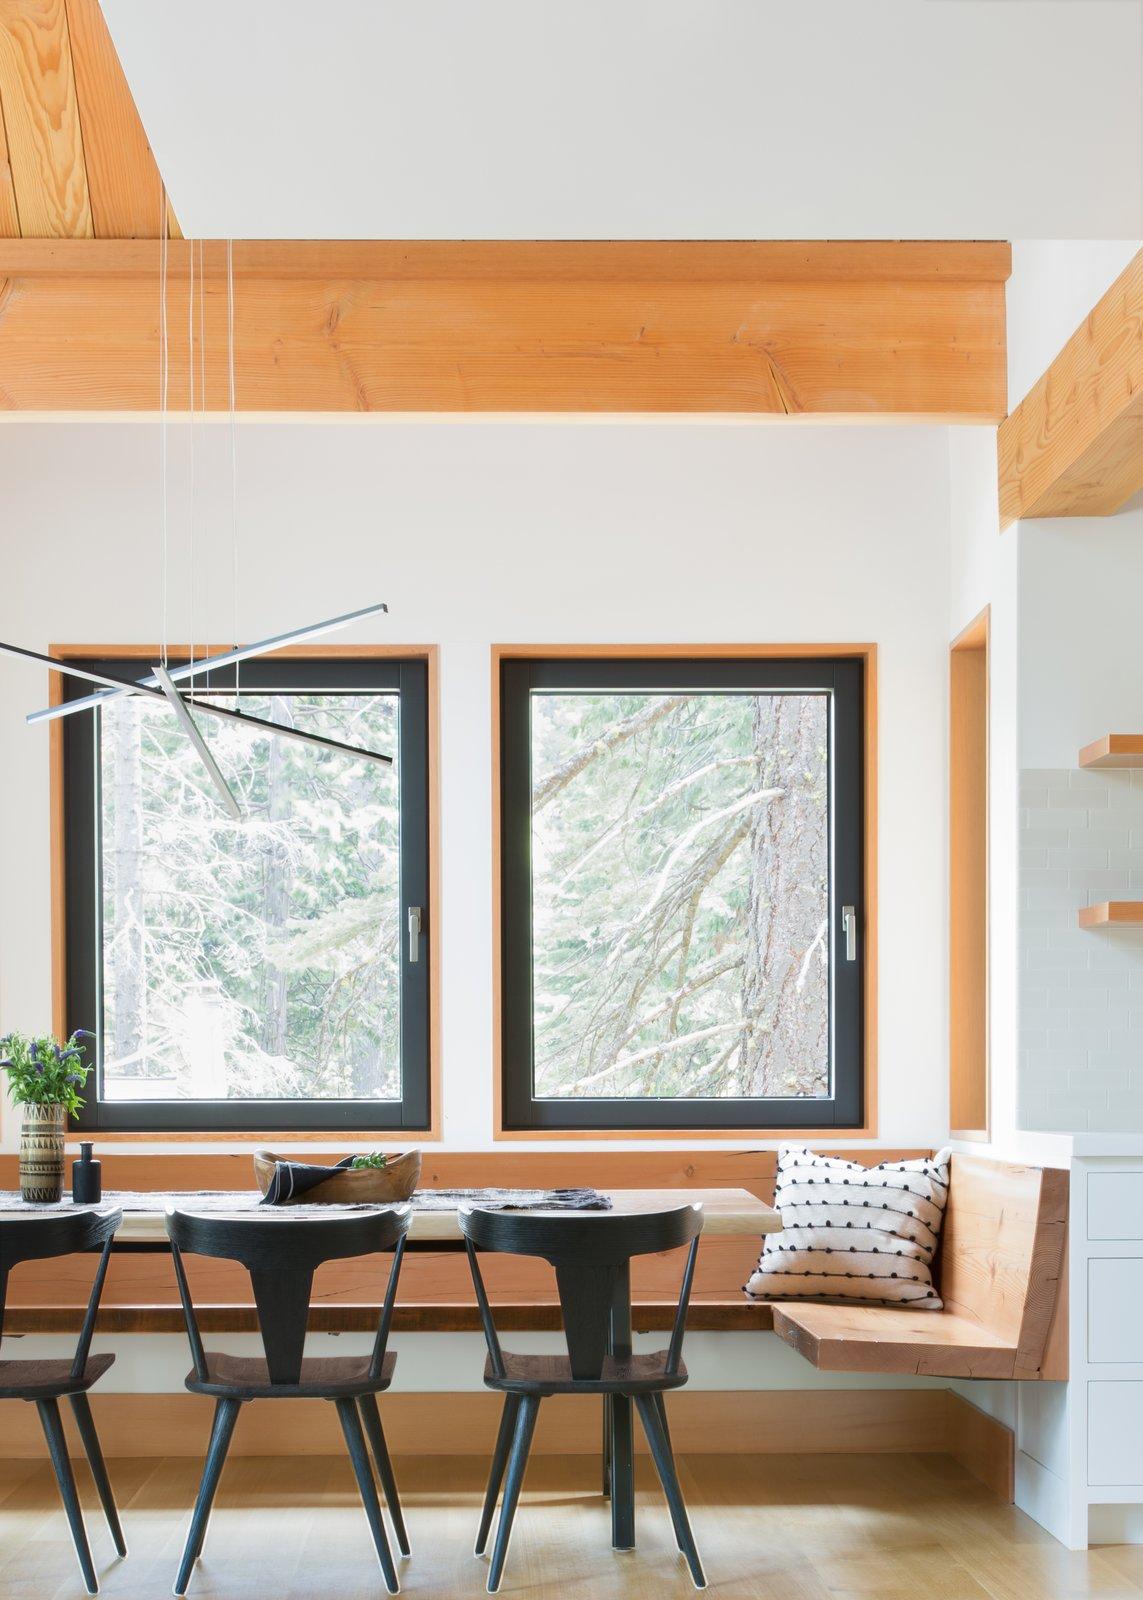 Dining Room, Bench, Chair, Pendant Lighting, Table, Light Hardwood Floor, and Ceiling Lighting  Woodsy Tahoe Cabin by Regan Baker Design